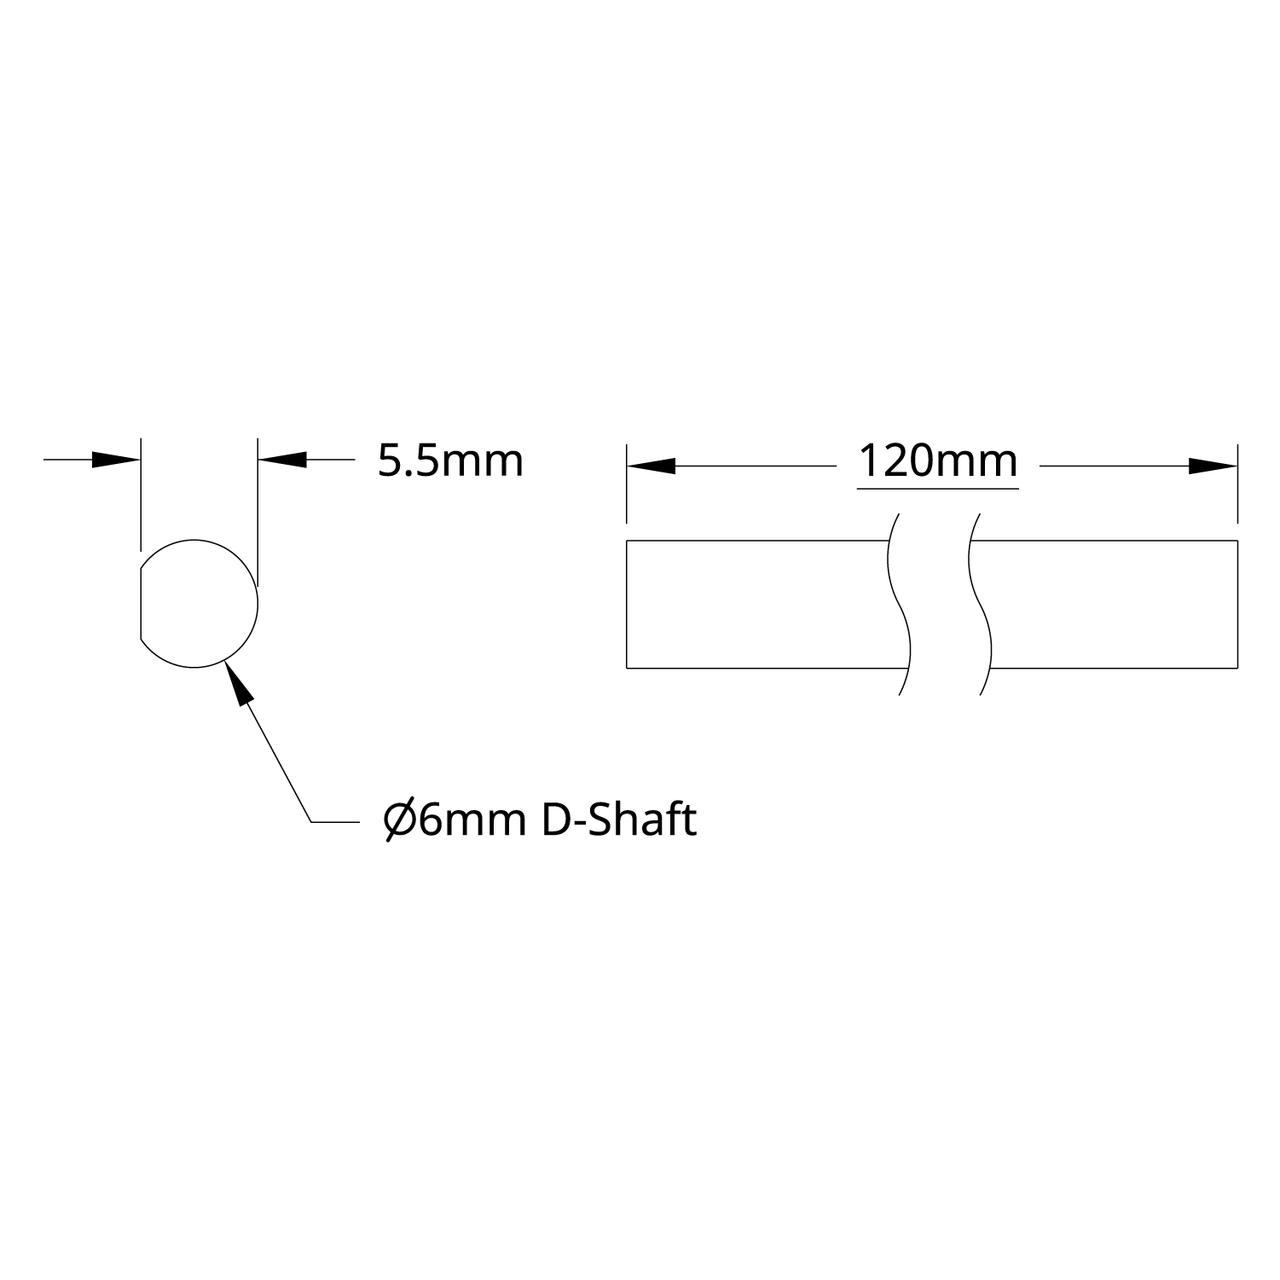 2101 Series Stainless Steel D-Shaft (6mm Diameter, 120mm Length)